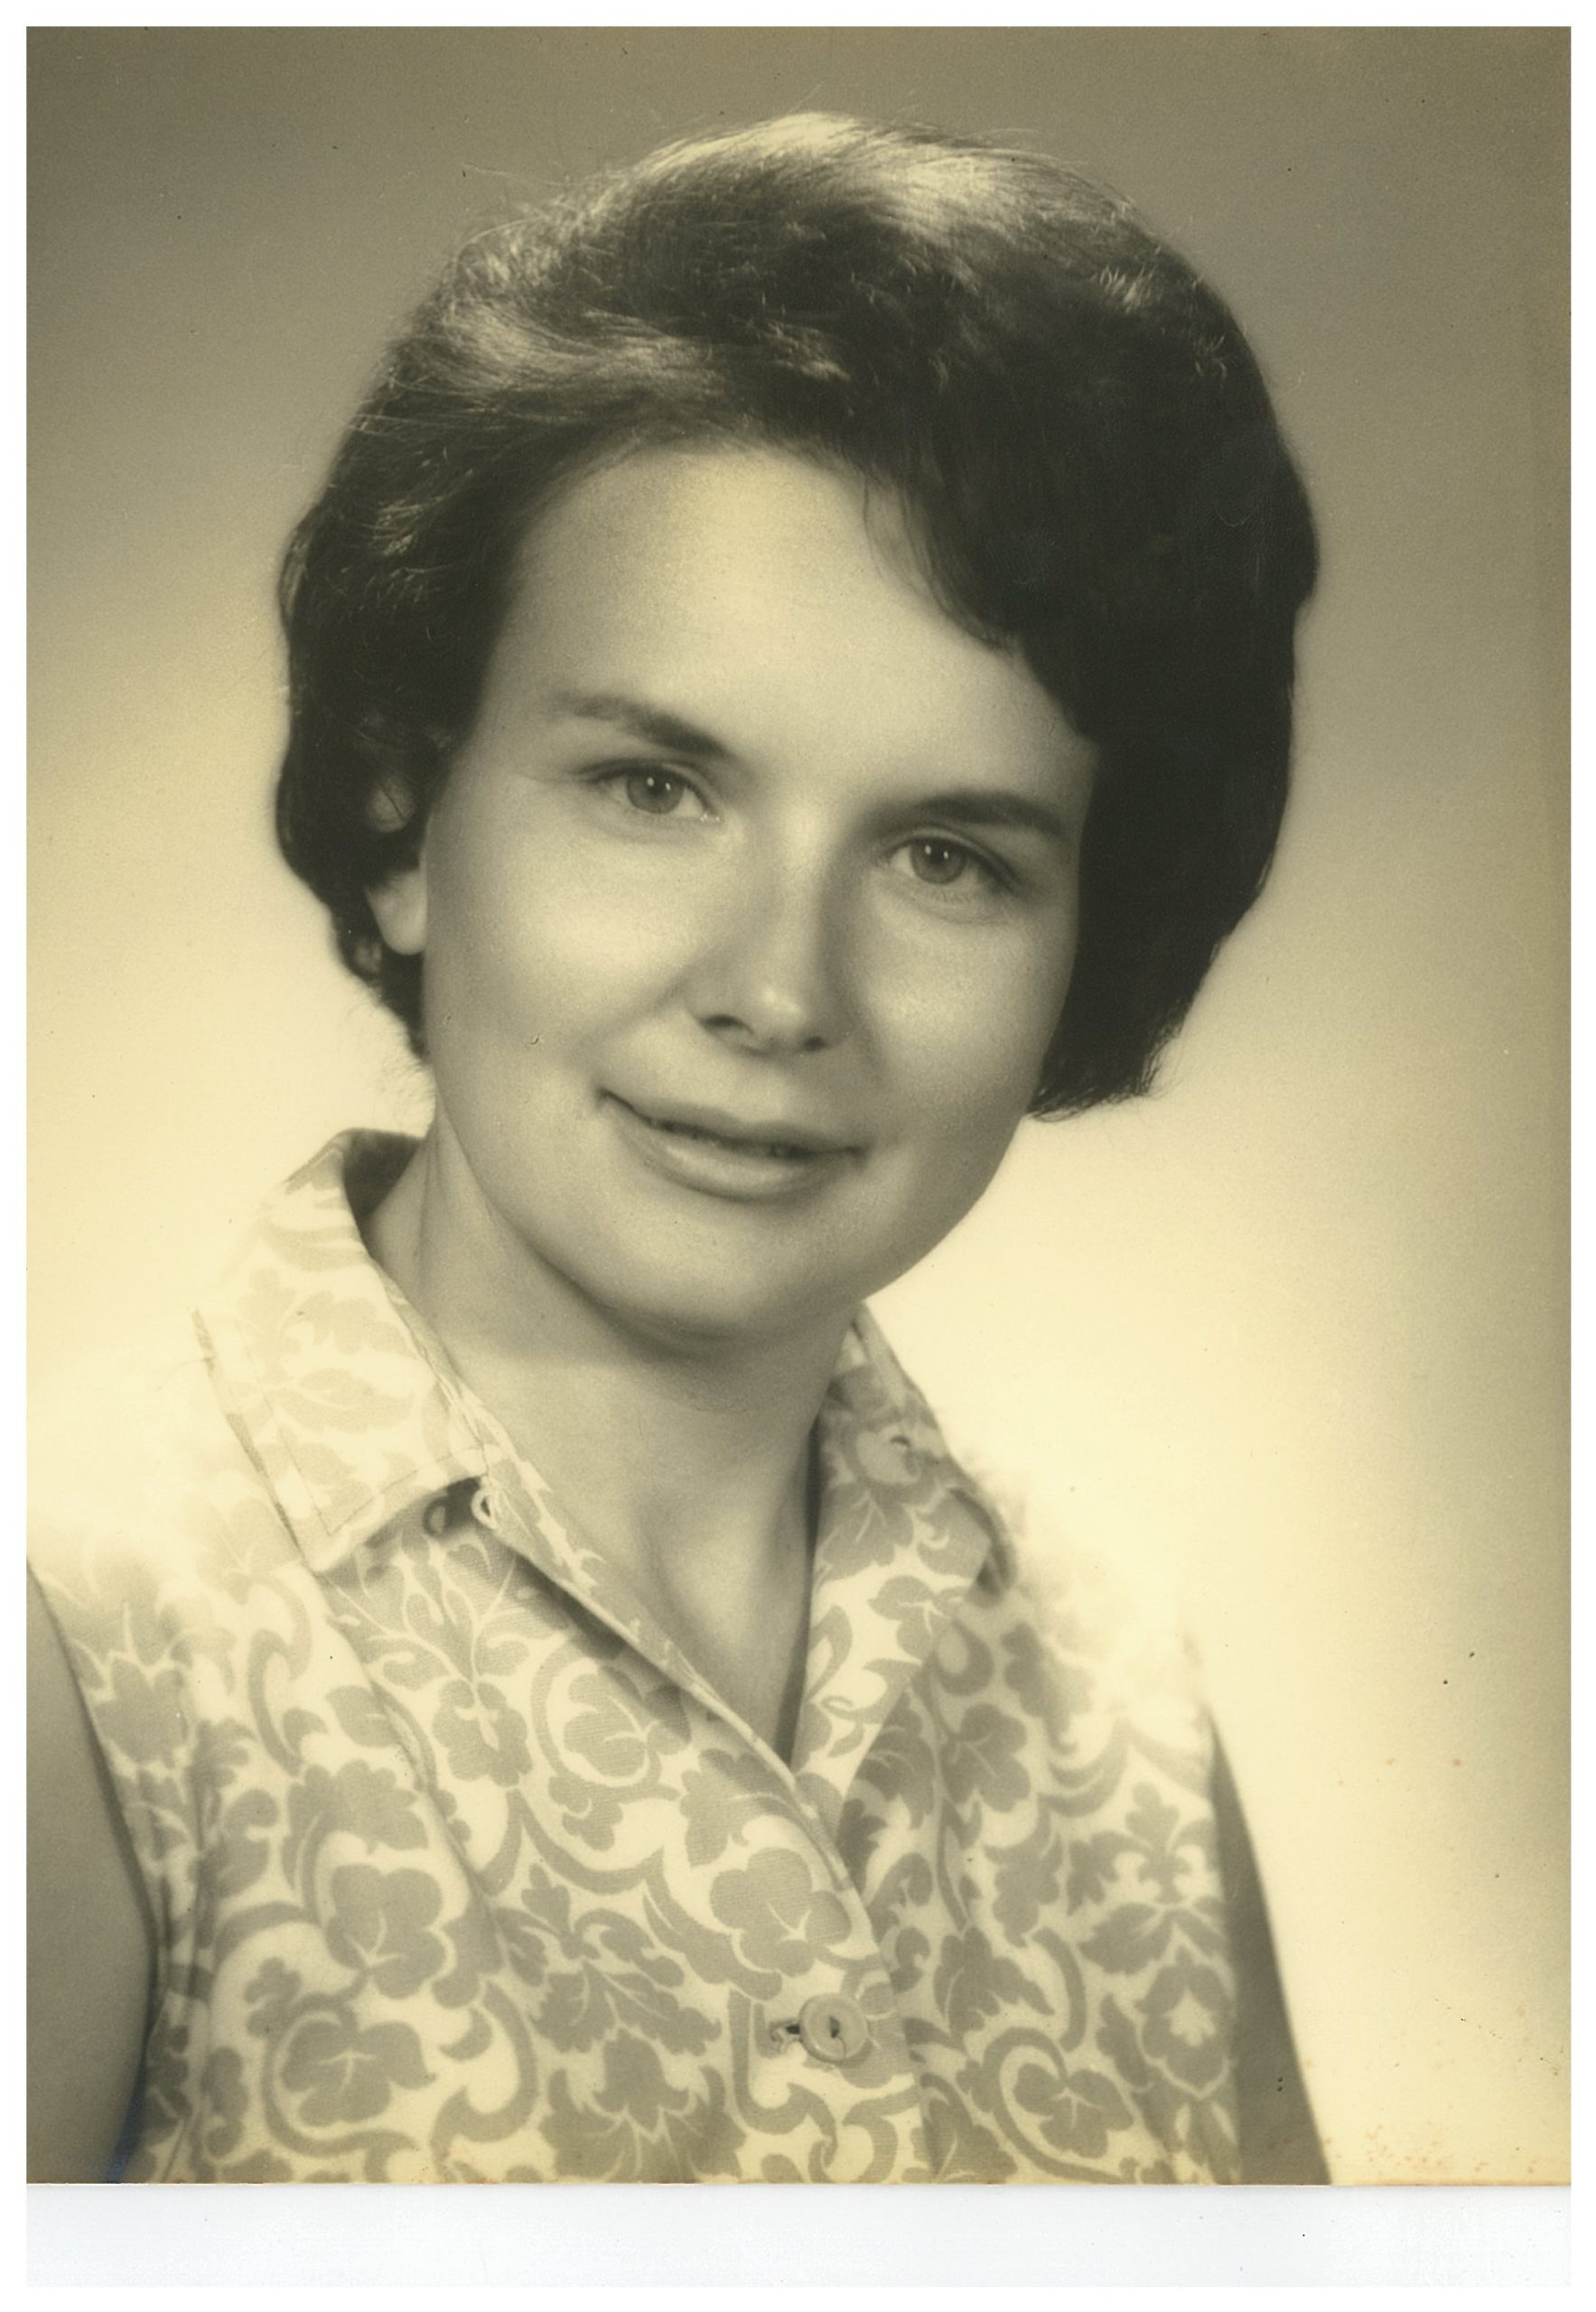 Margaret Reaves scaled